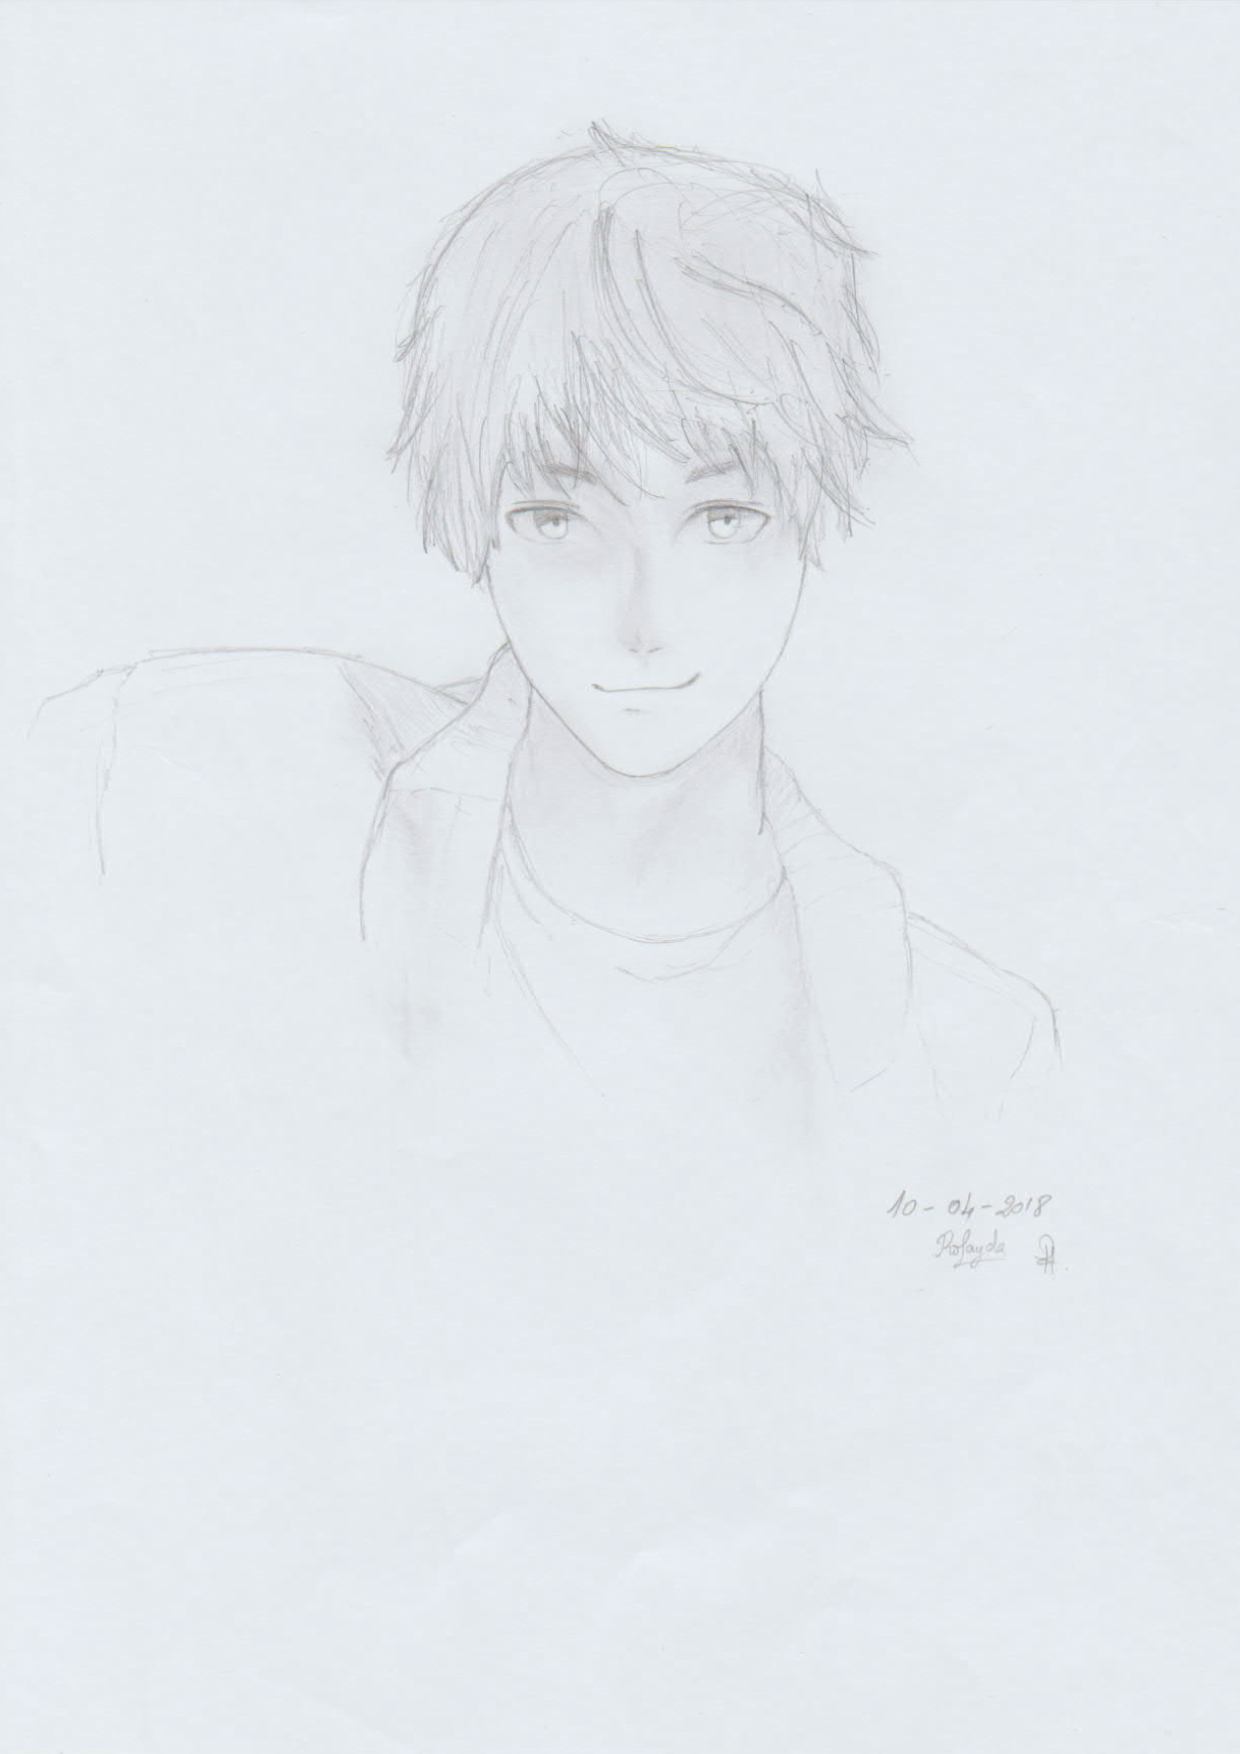 portraitboysmile